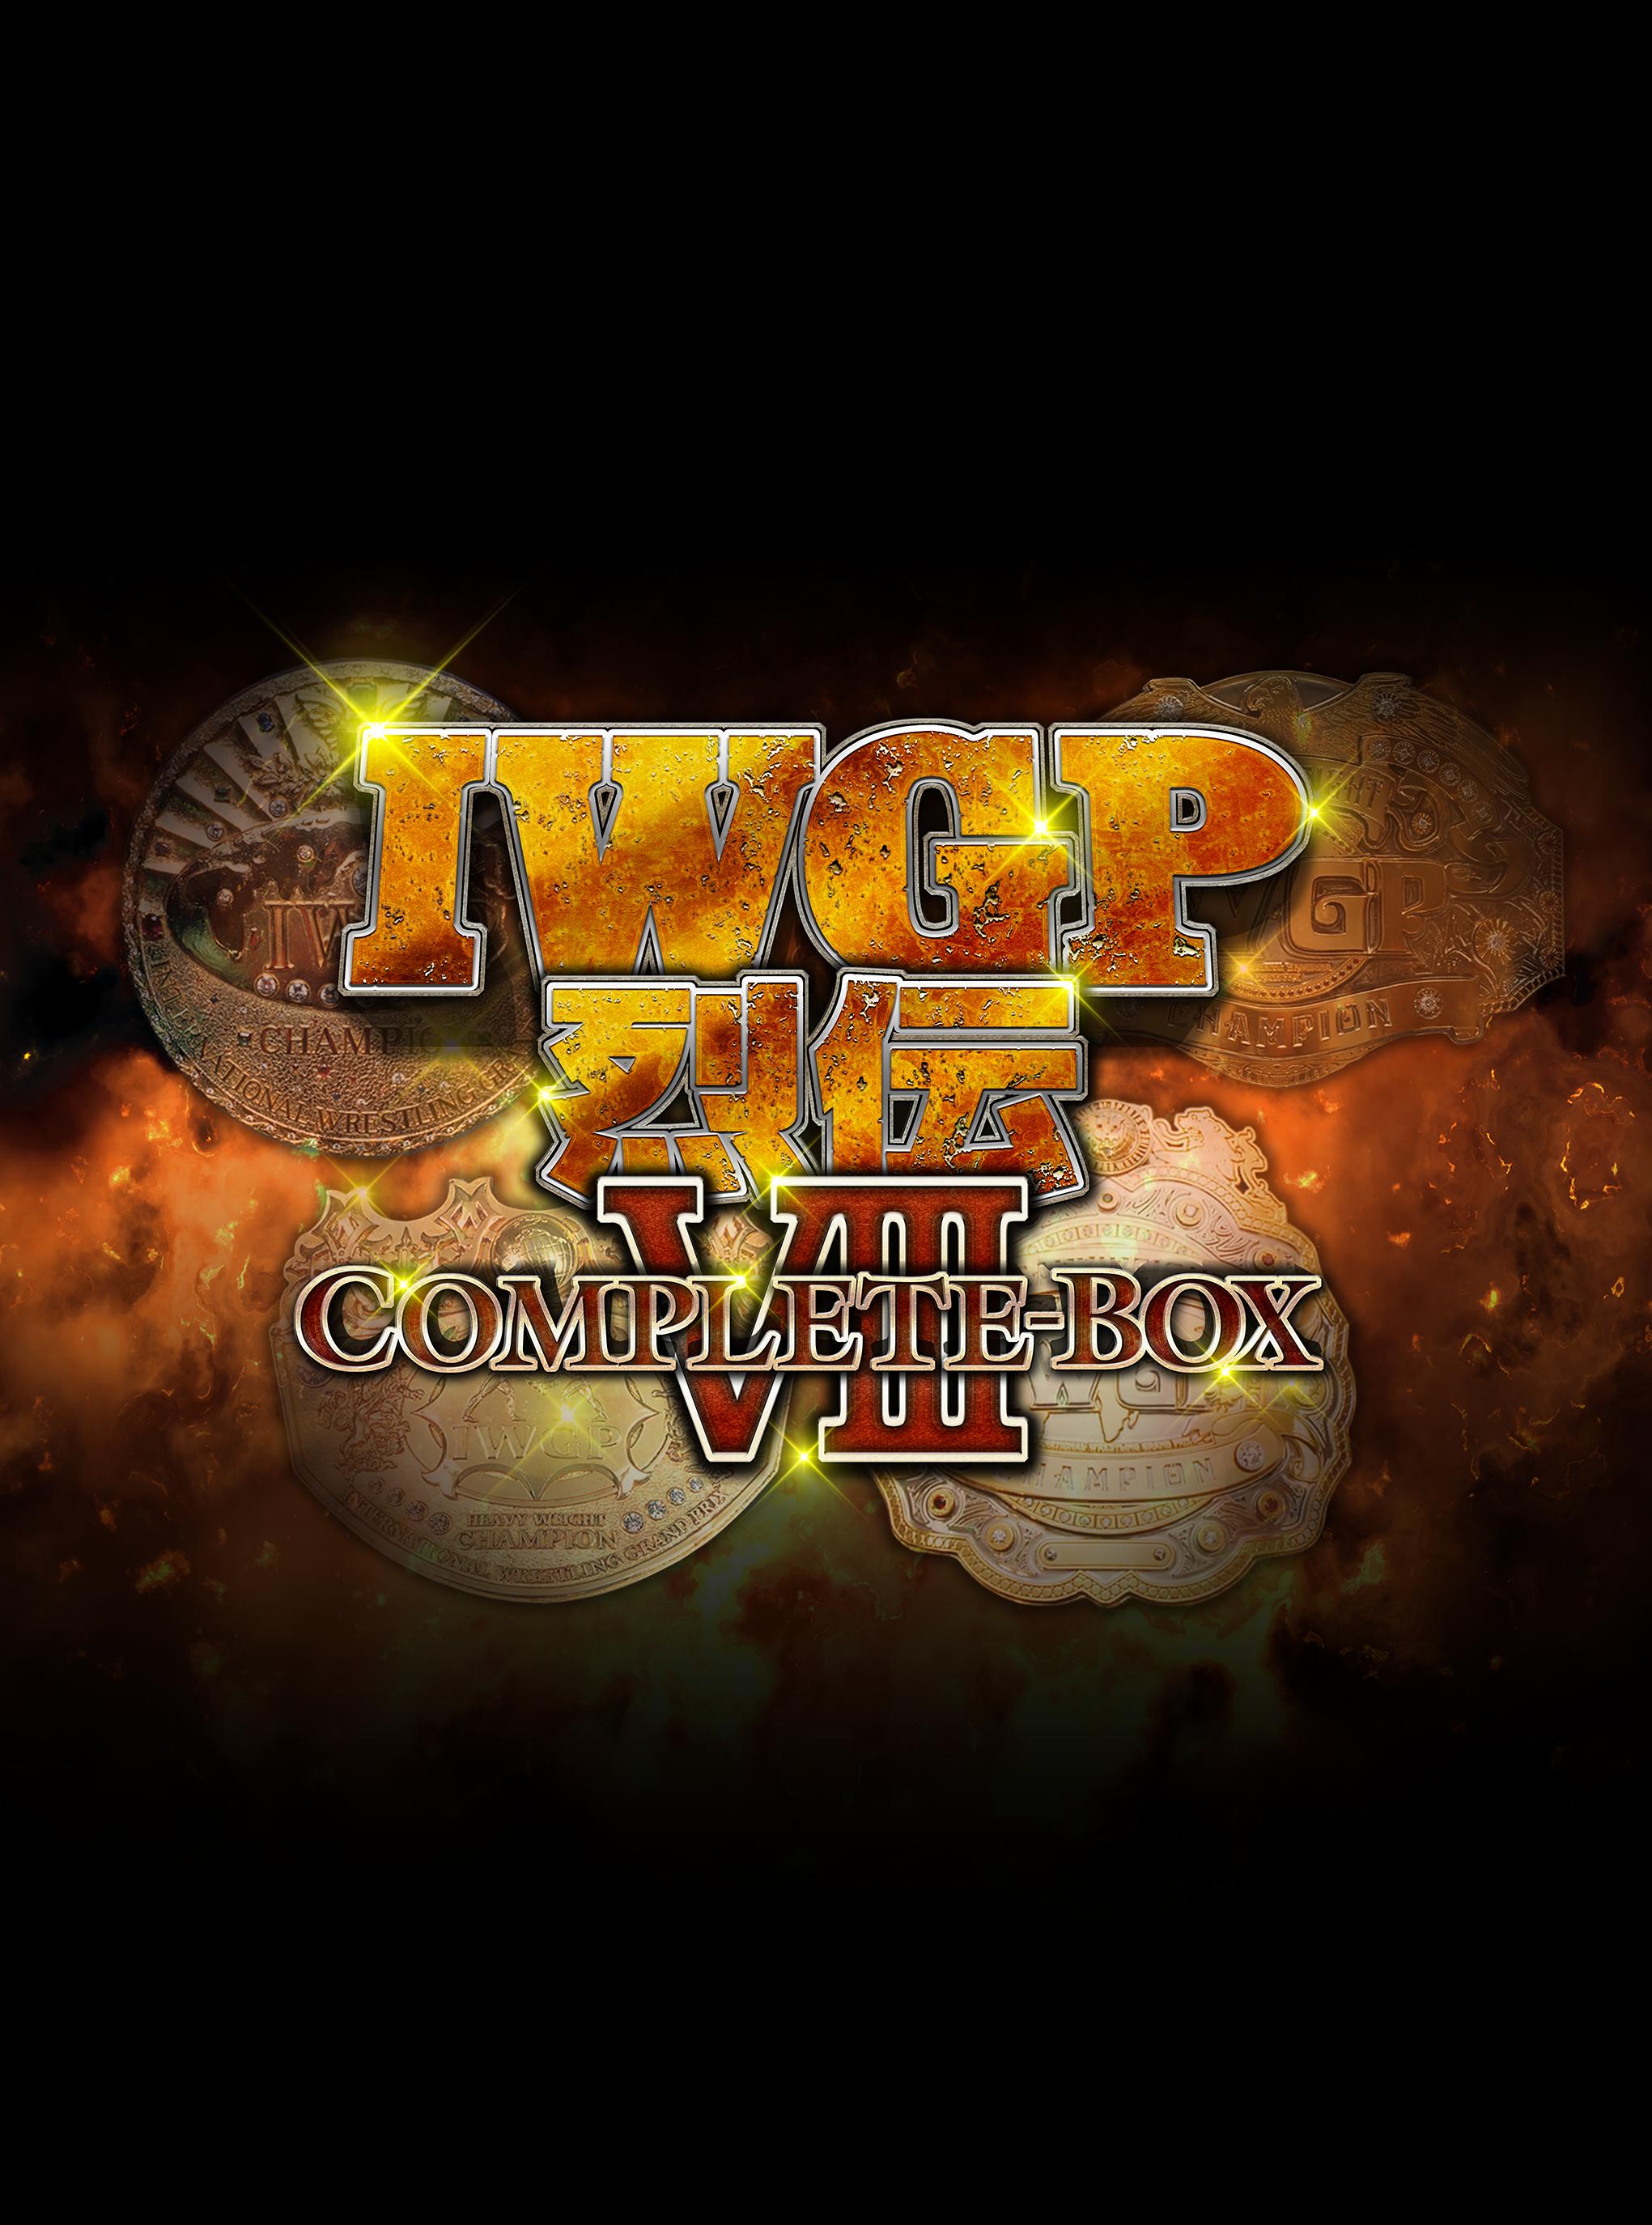 IWGP烈伝COMPLETE-BOX Ⅷ  2010年6月19日第54代IWGPヘビー級王者真壁刀義初防衛戦~2012年6月19日第58代IWGPヘビー級王者棚橋弘至誕生までを収録。【Blu-ray-BOX】